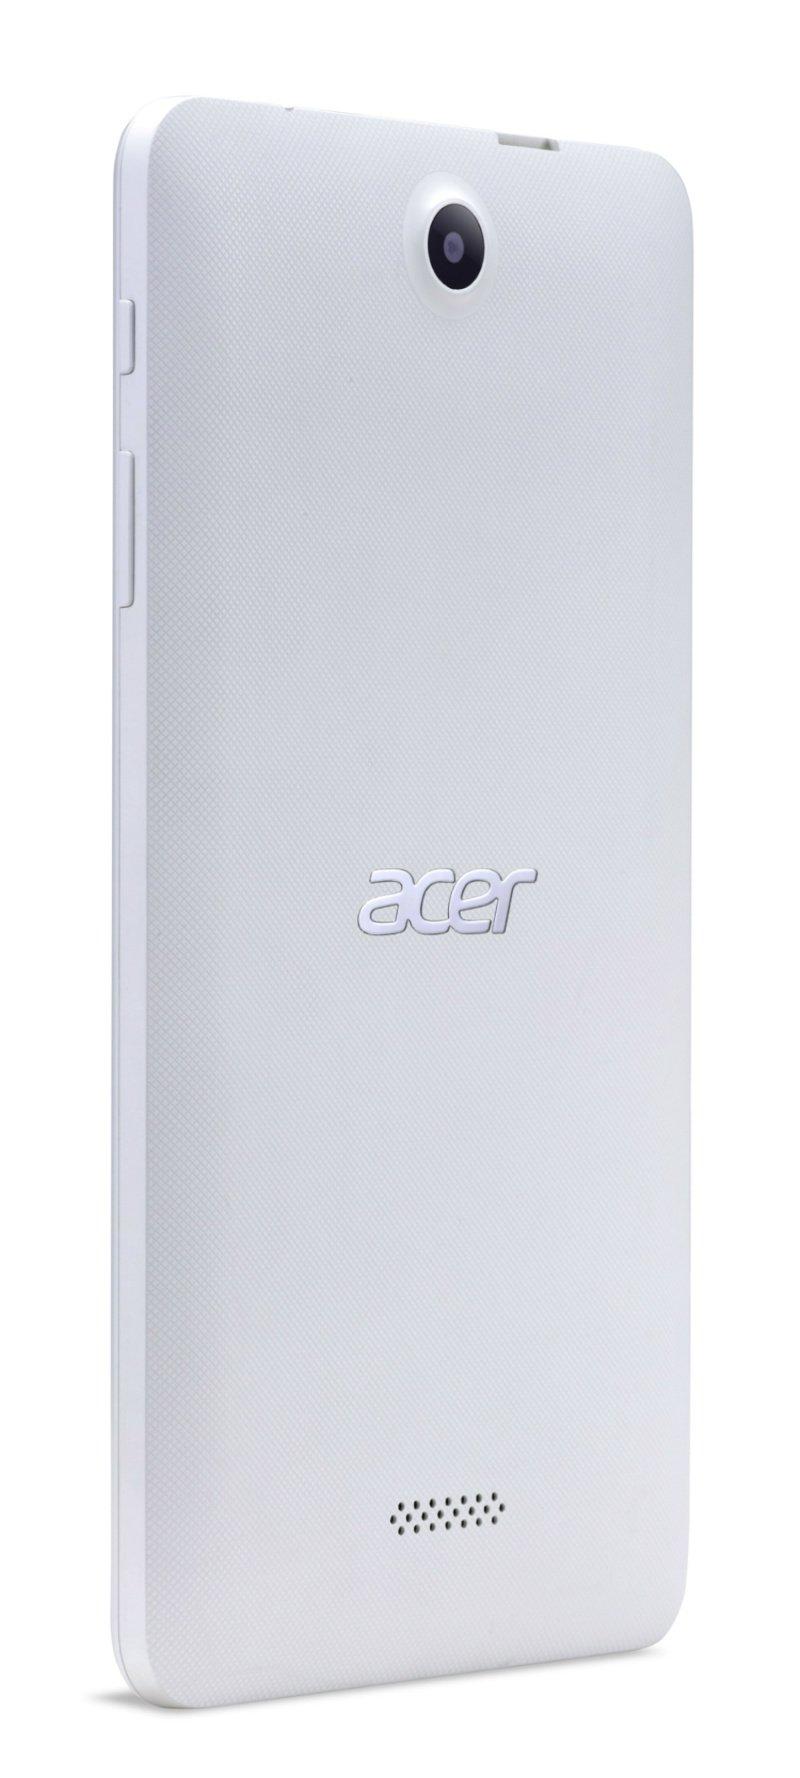 Acer-Iconia-7-Kids-AH-Press-12-w800